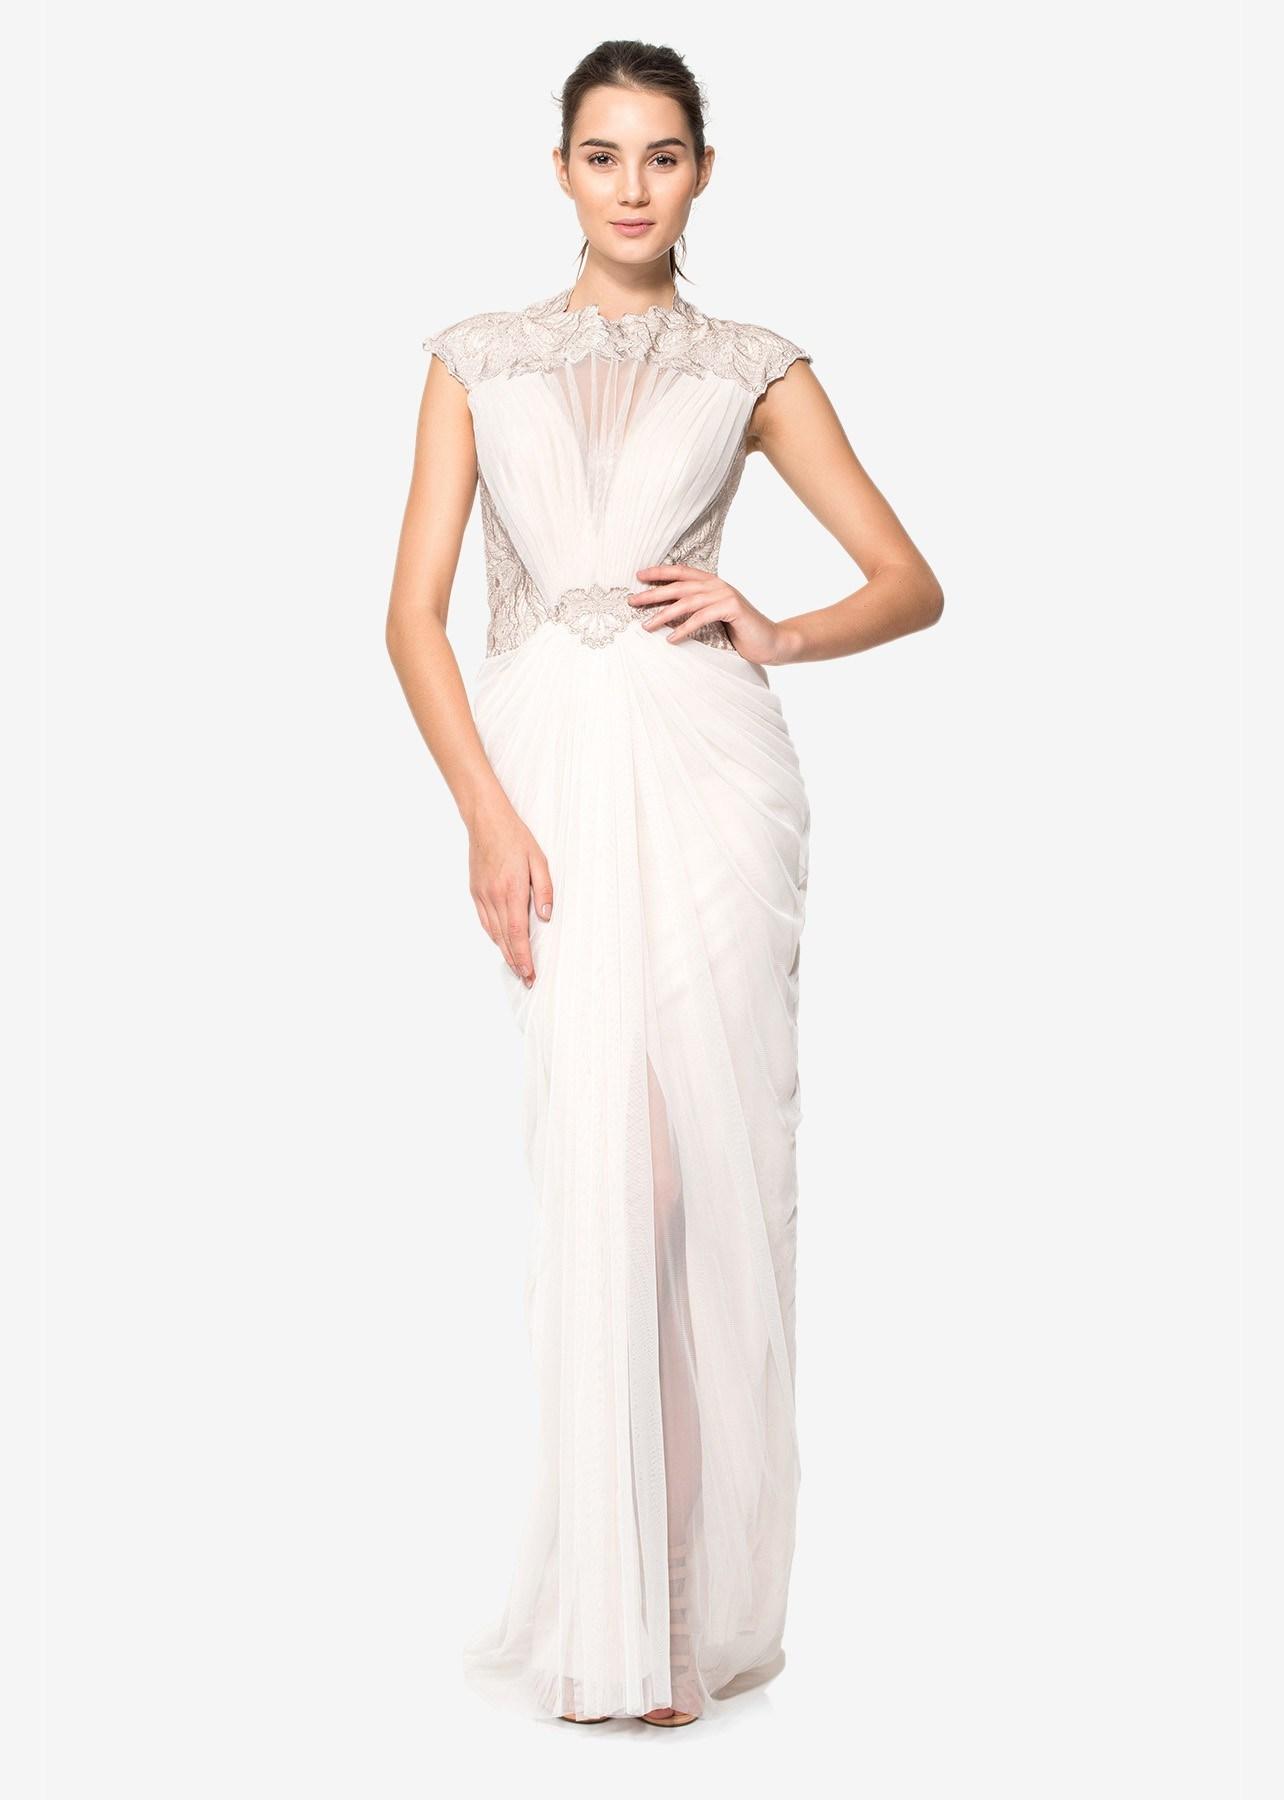 2018 Charming A Line Spaghetti Straps Sleeveless Beaded Floor Length Evening Dress for Wedding (HS036)